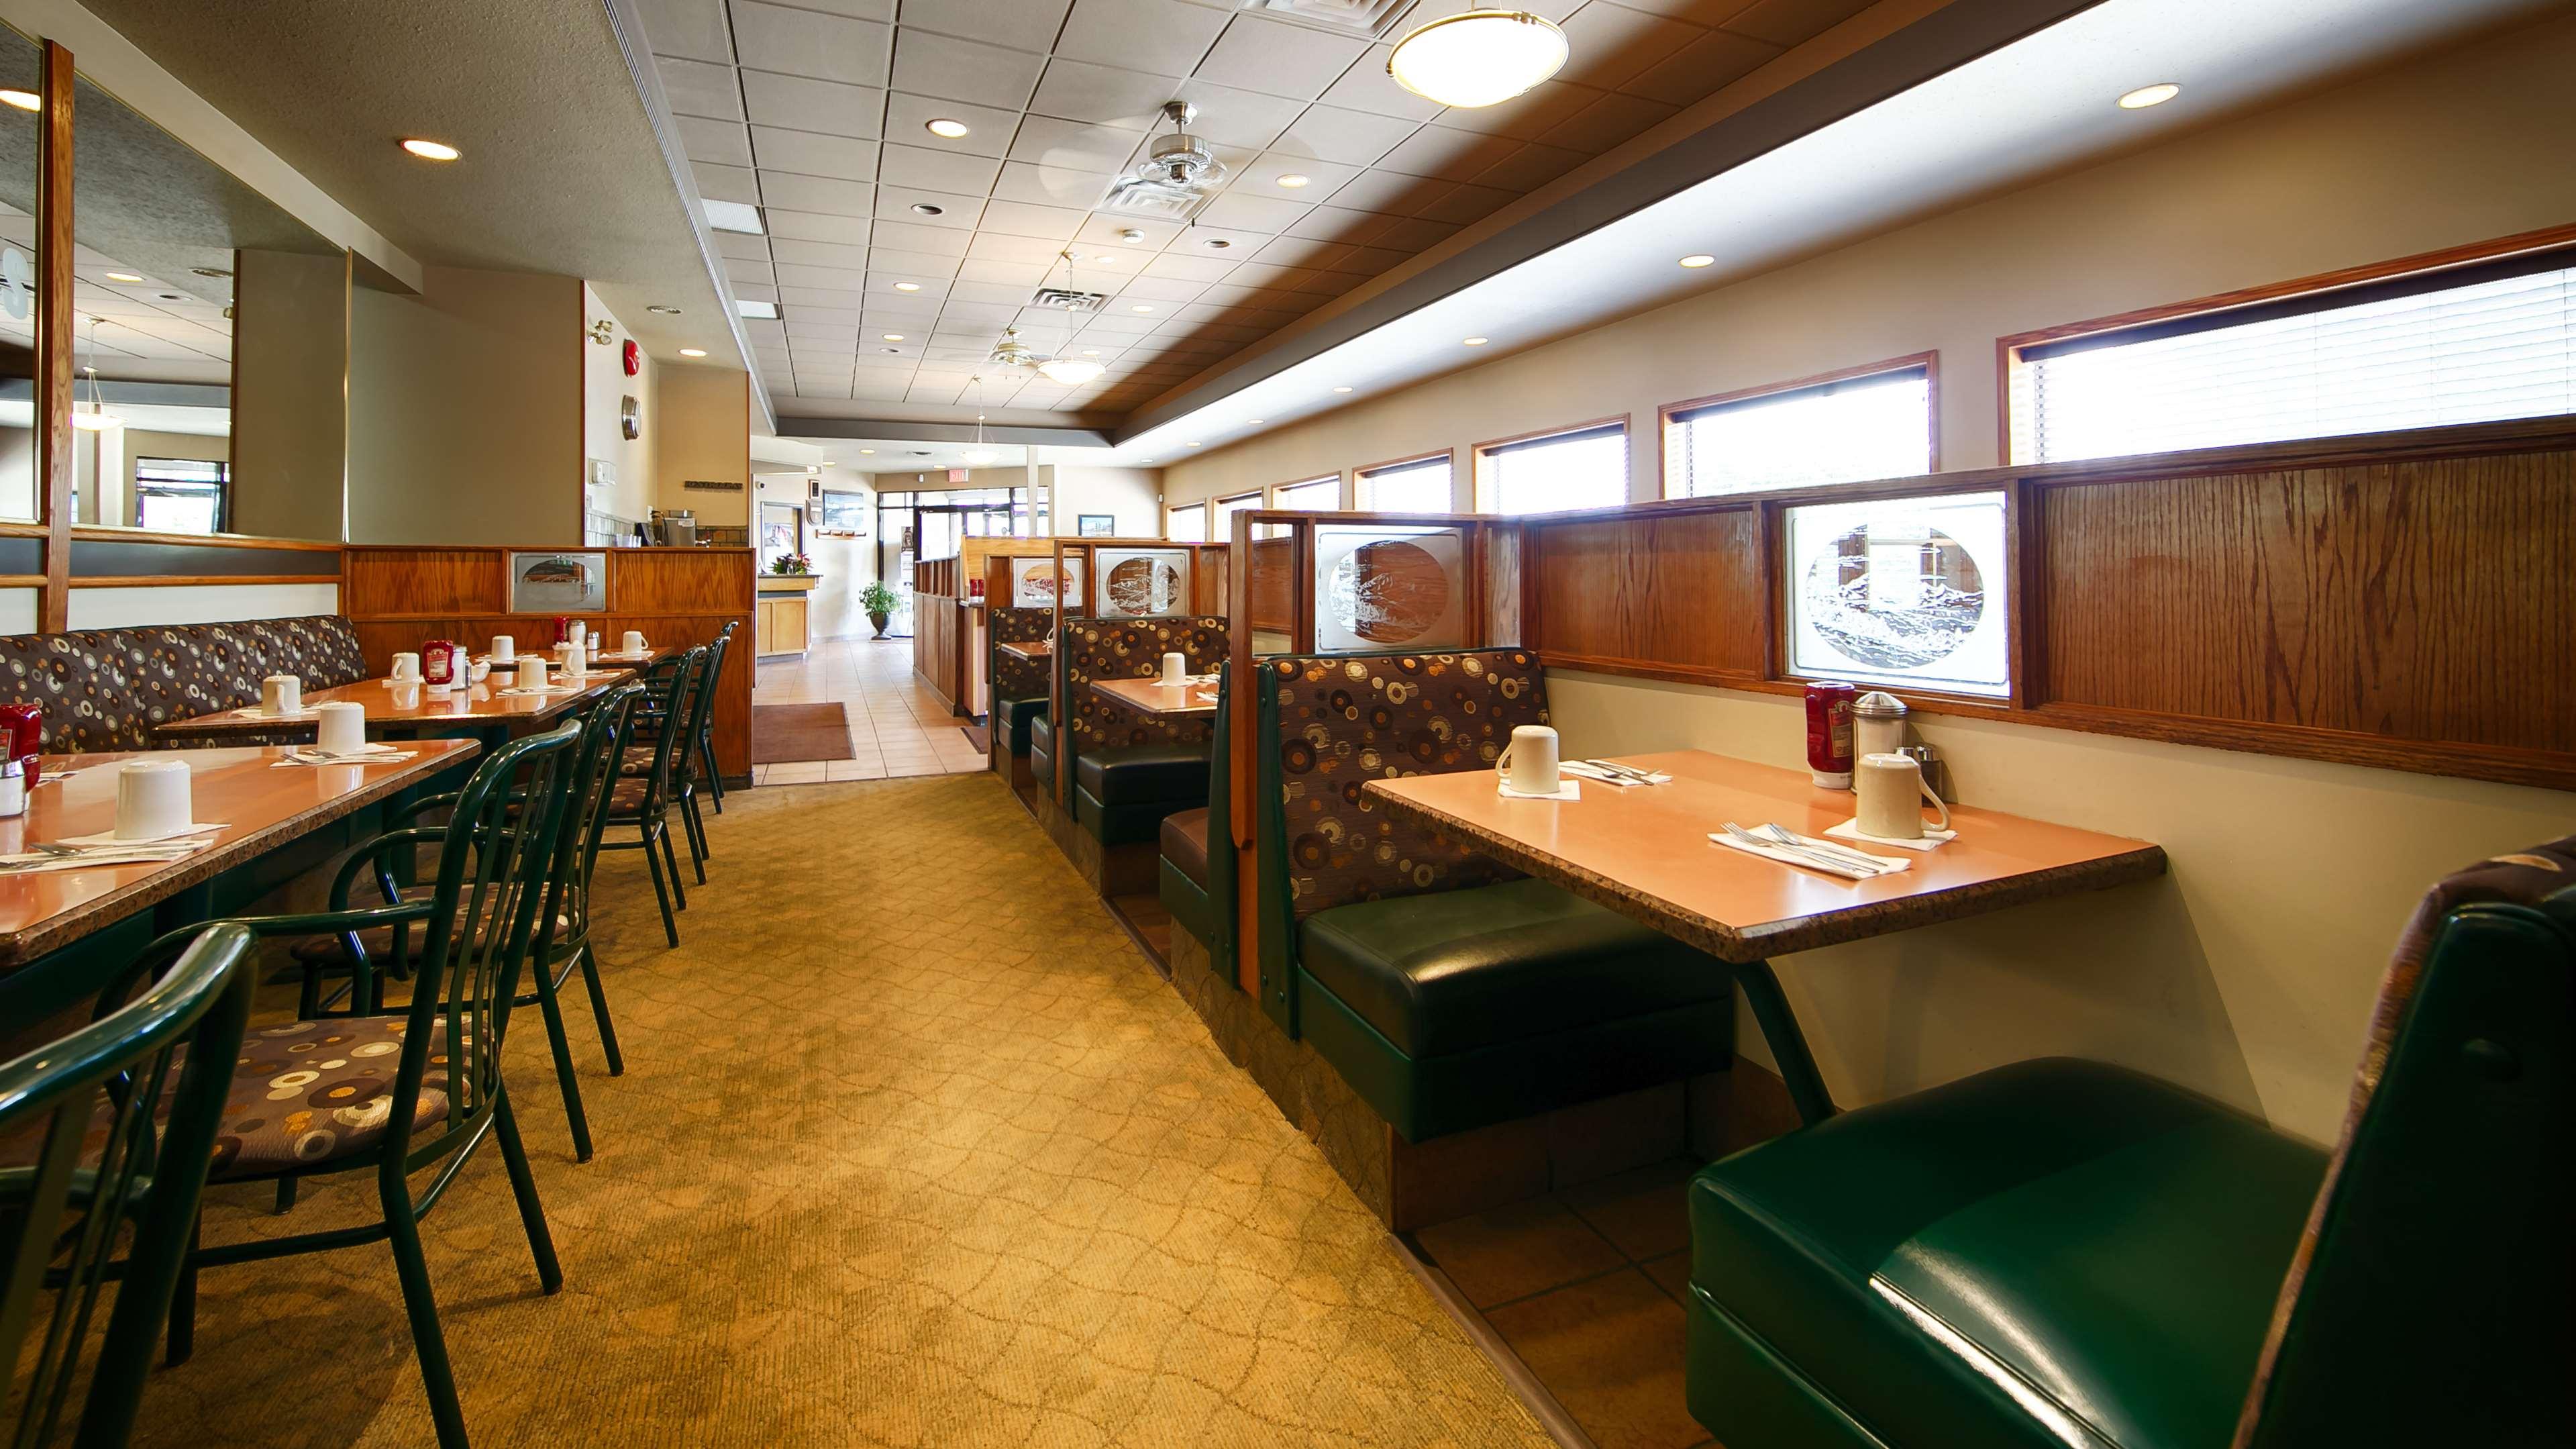 Best Western Bakerview Inn in Abbotsford: On-Site Restaurant